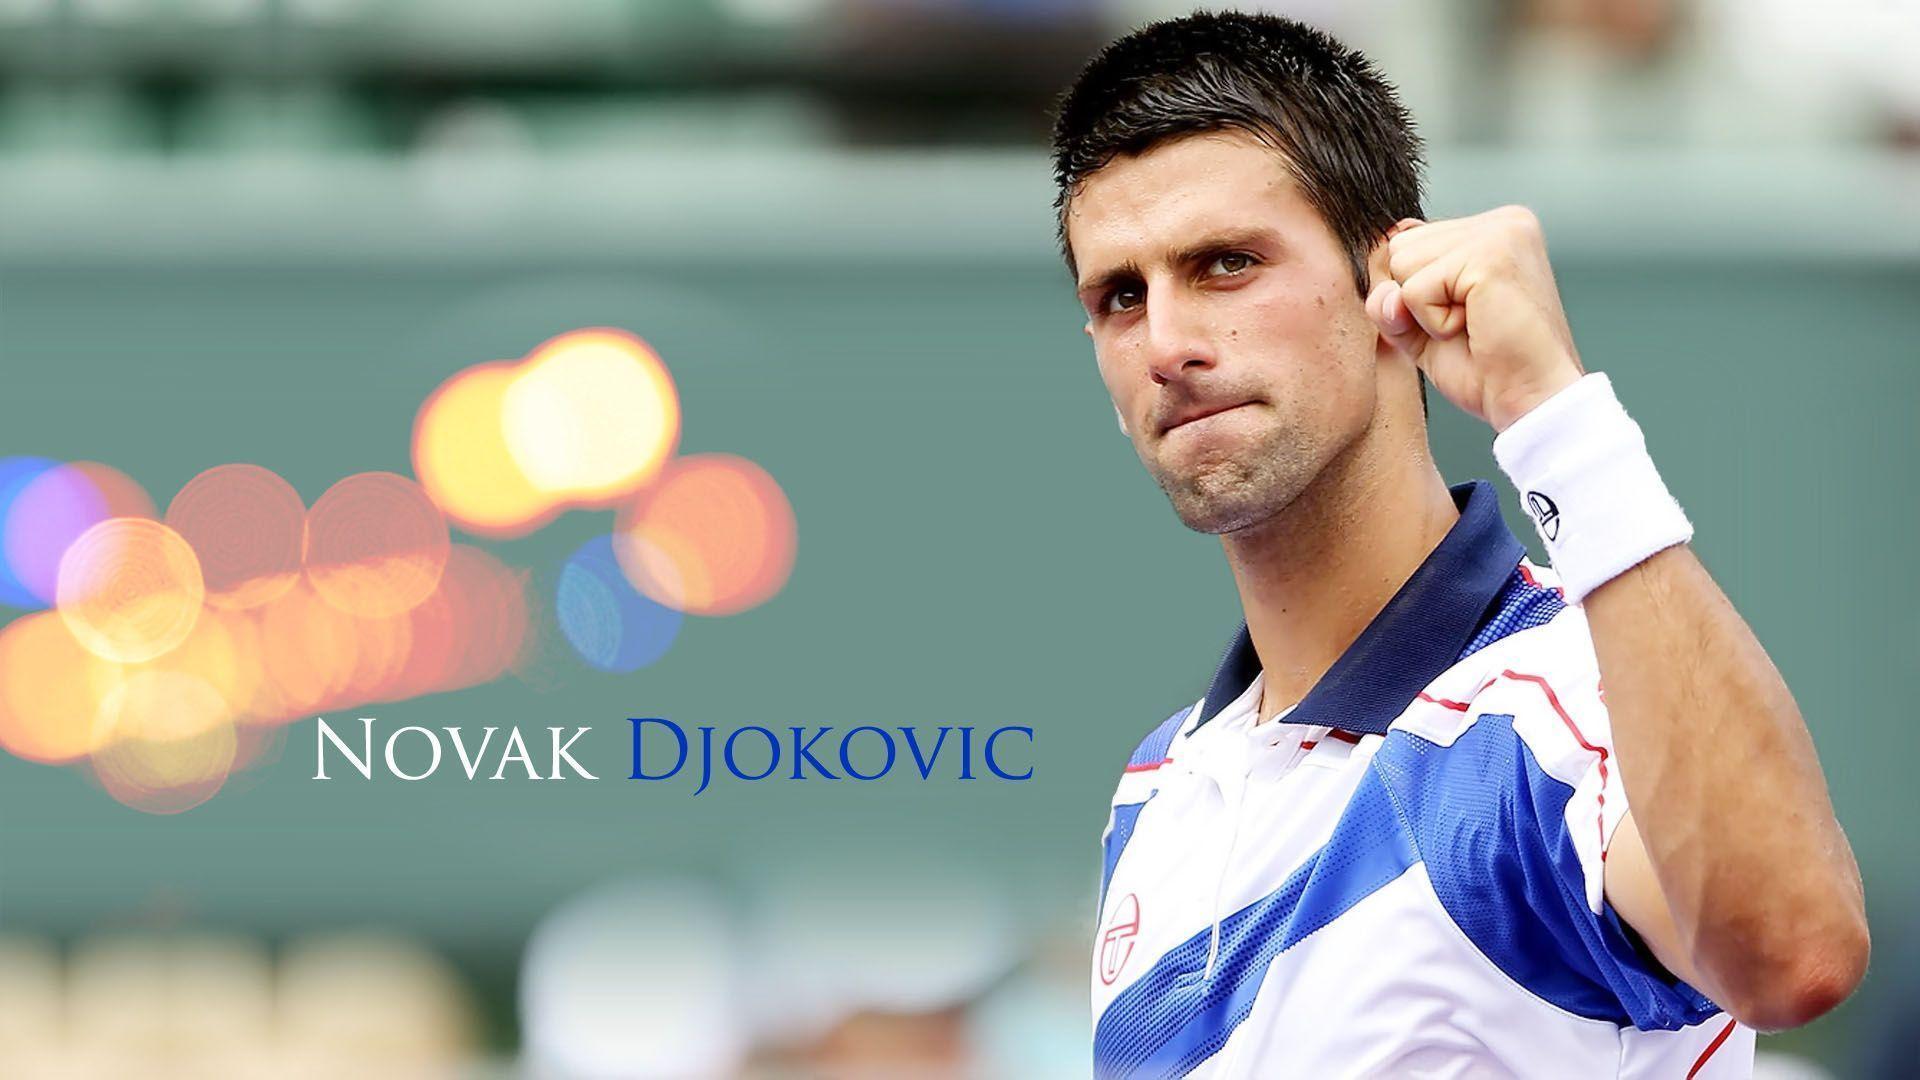 Champion Novak Djokovic Wimbledon 2014 Wallpaper , Free Widescreen ...